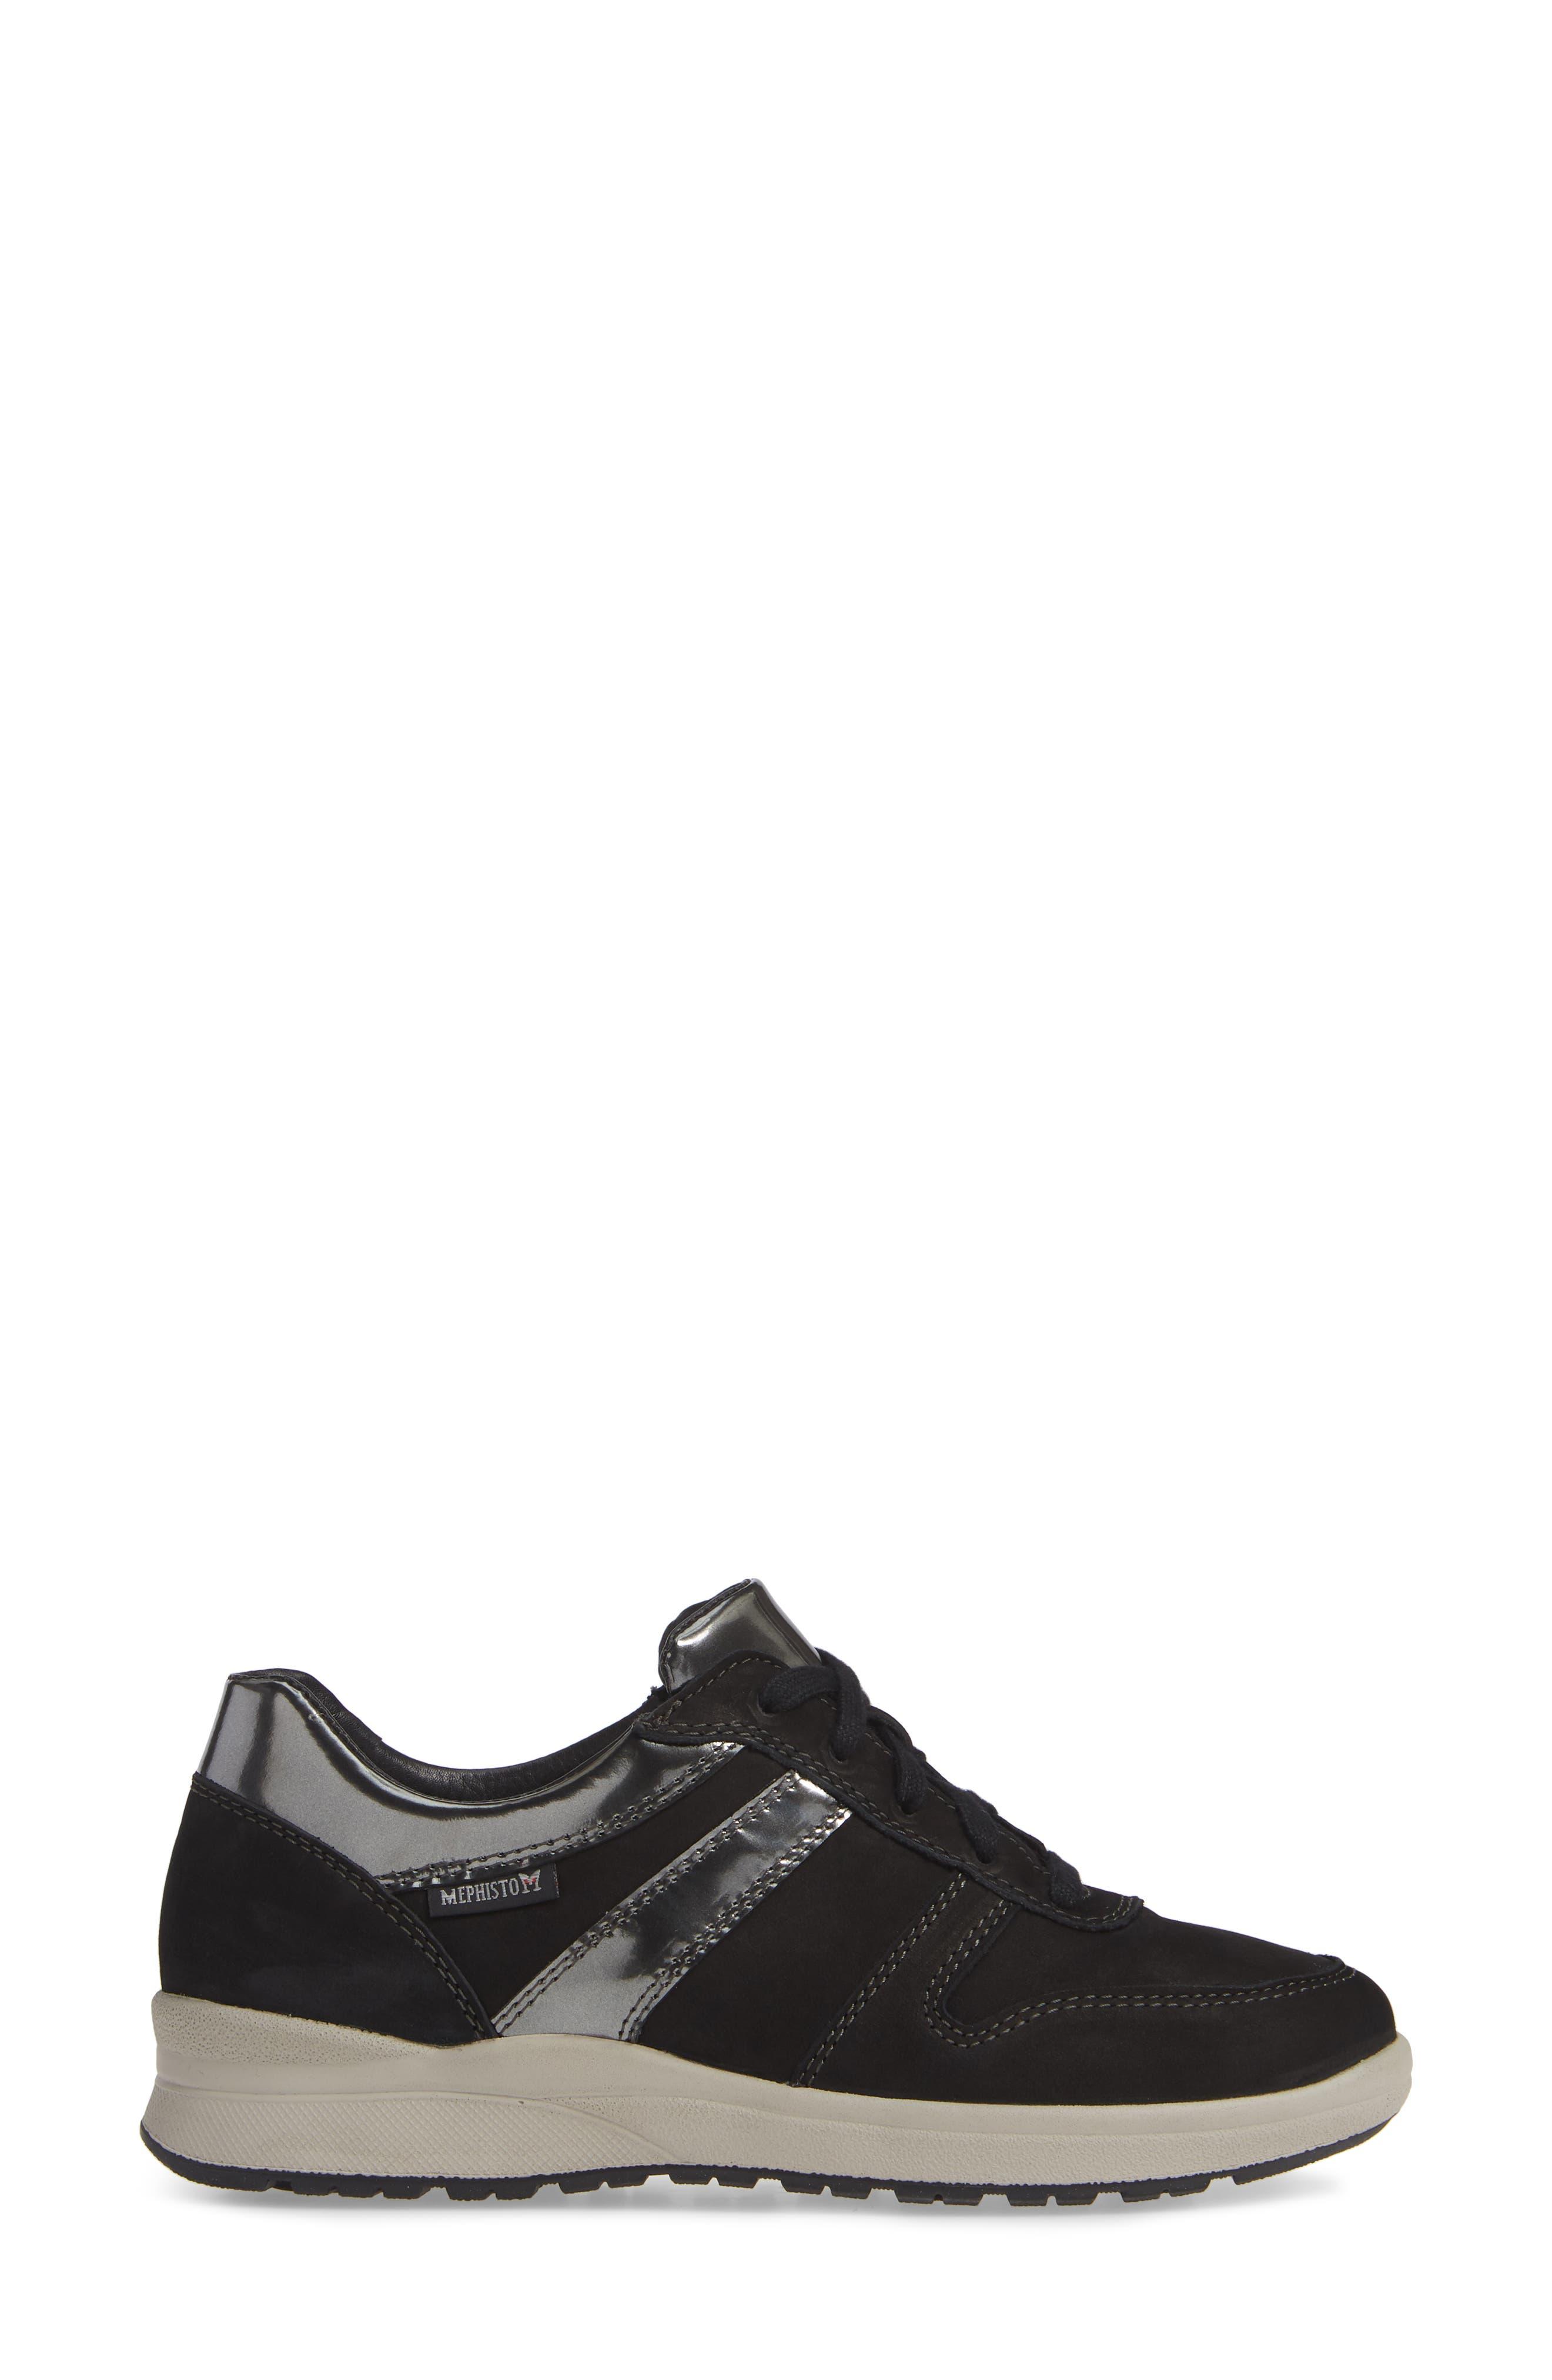 MEPHISTO, Rebeca Sneaker, Alternate thumbnail 3, color, BLACK FABRIC